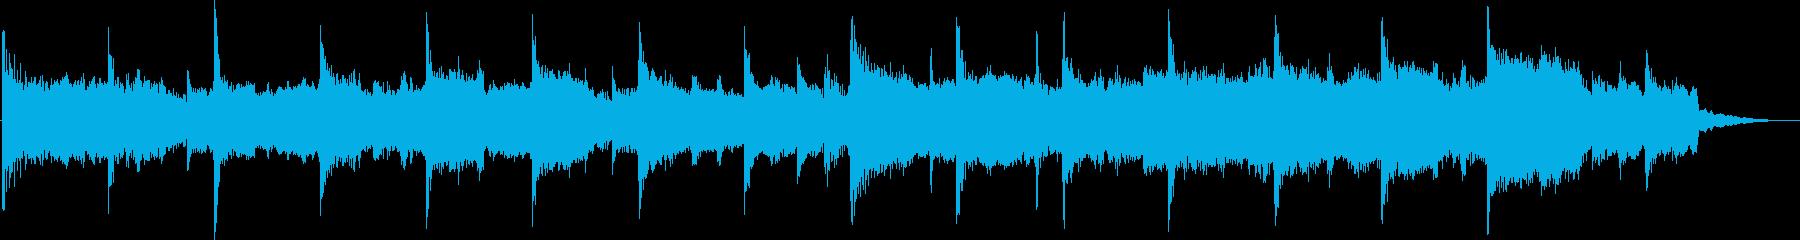 Sad and painful ballad jingle's reproduced waveform